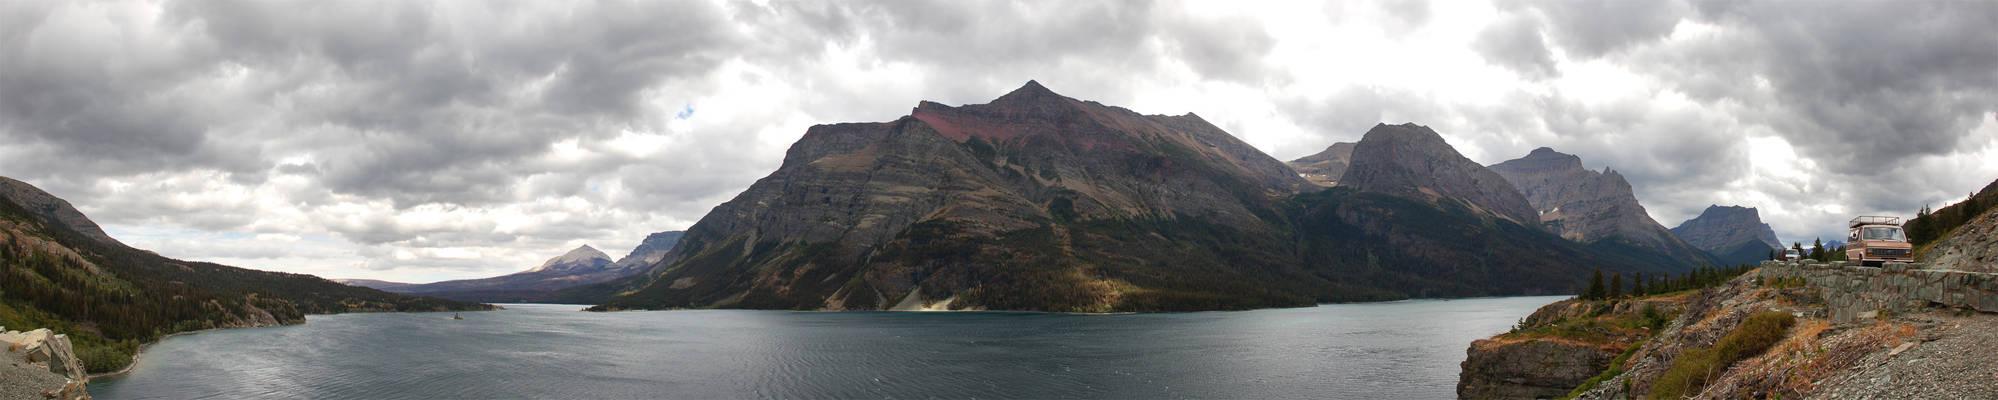 Saint Mary Lake 2 2007-08-20